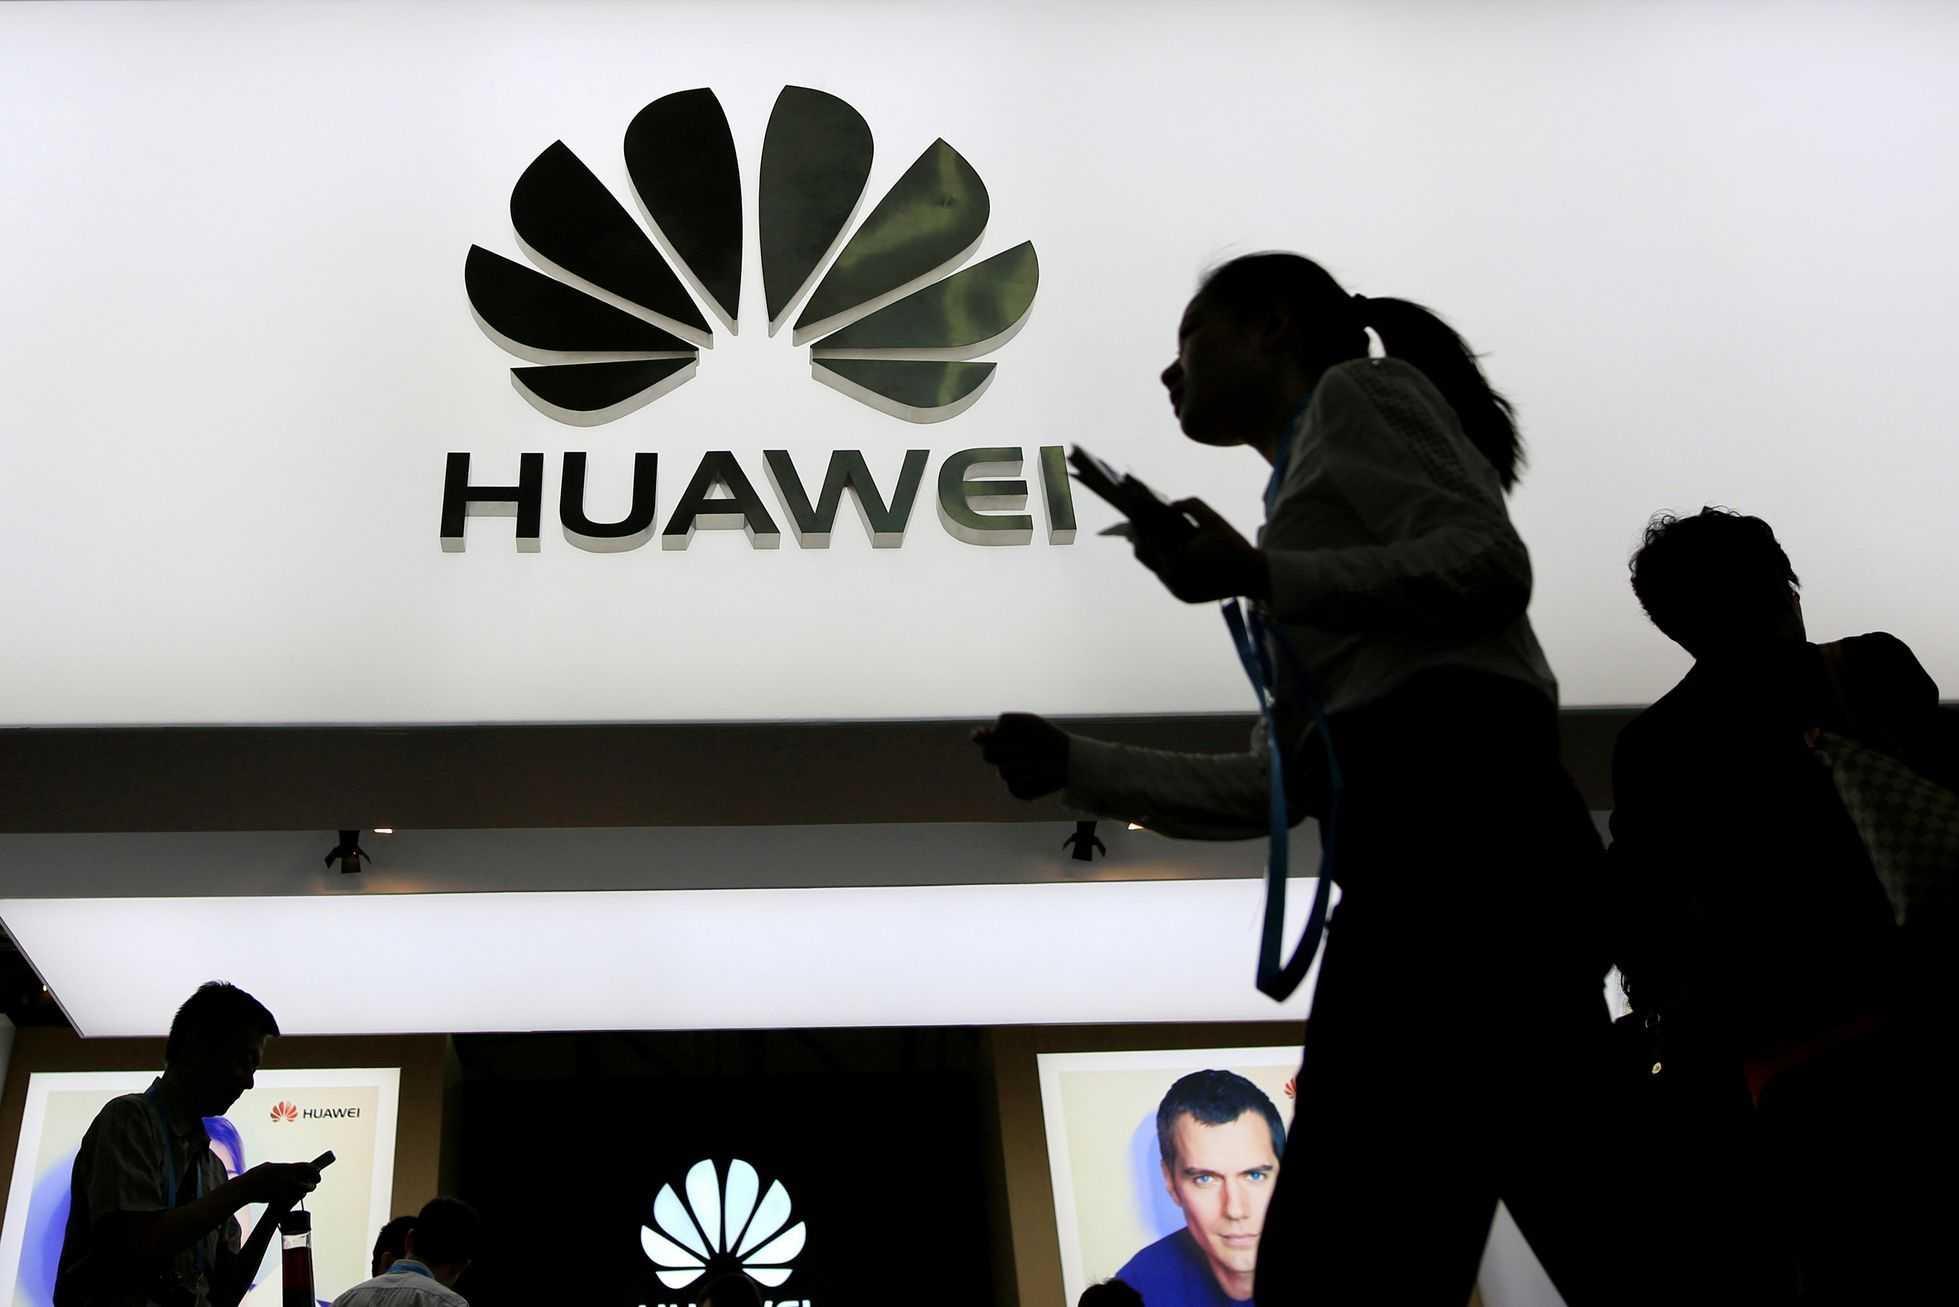 Компания foxconn остановила производство смартфонов huawei из-за политики сша ► последние новости